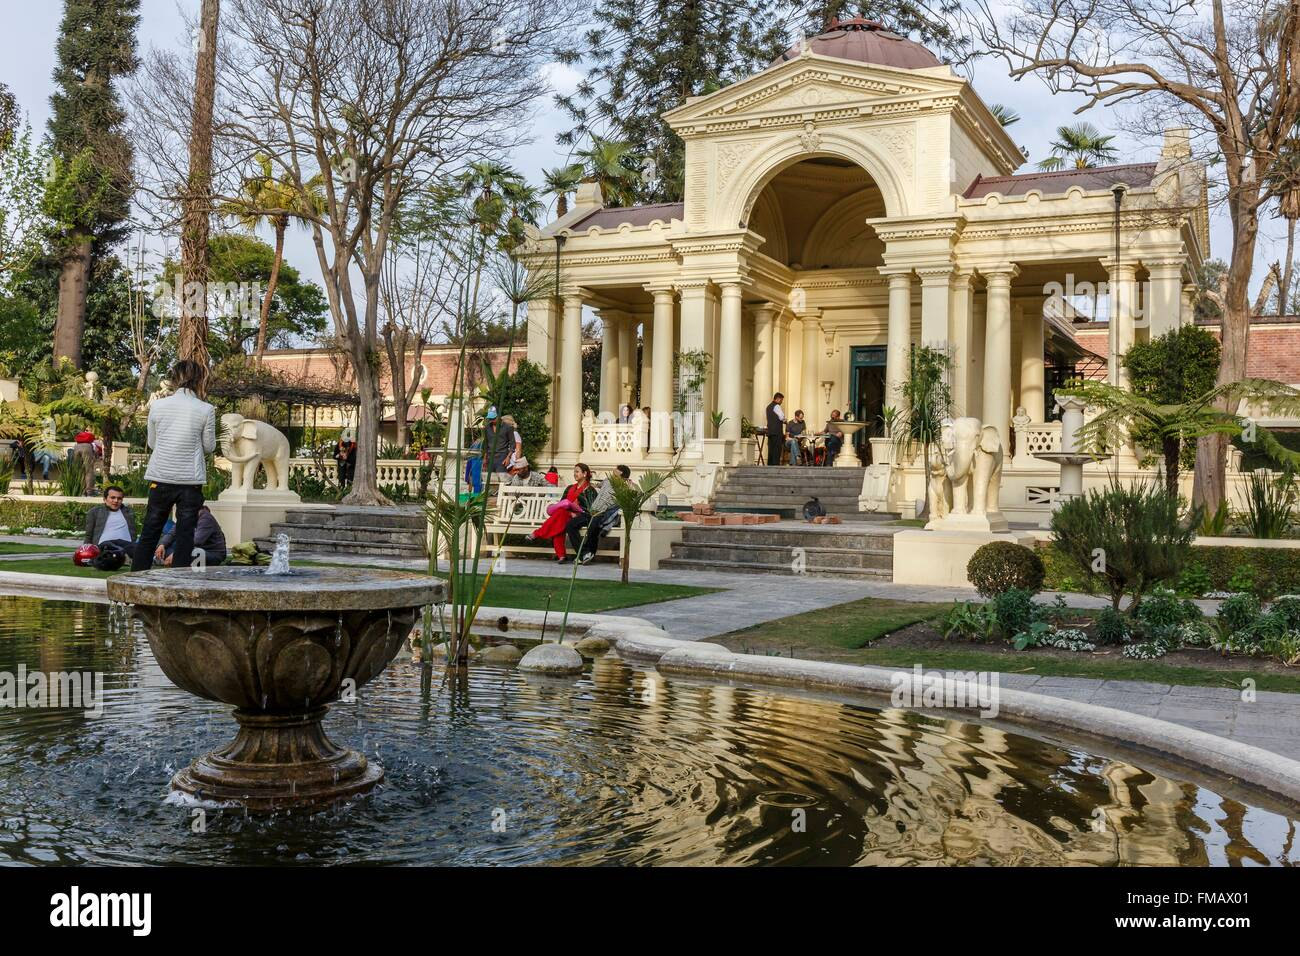 Nepal, Bagmati zone, Kathmandu, Thamel, Dreams garden and Kaiser cafe - Stock Image